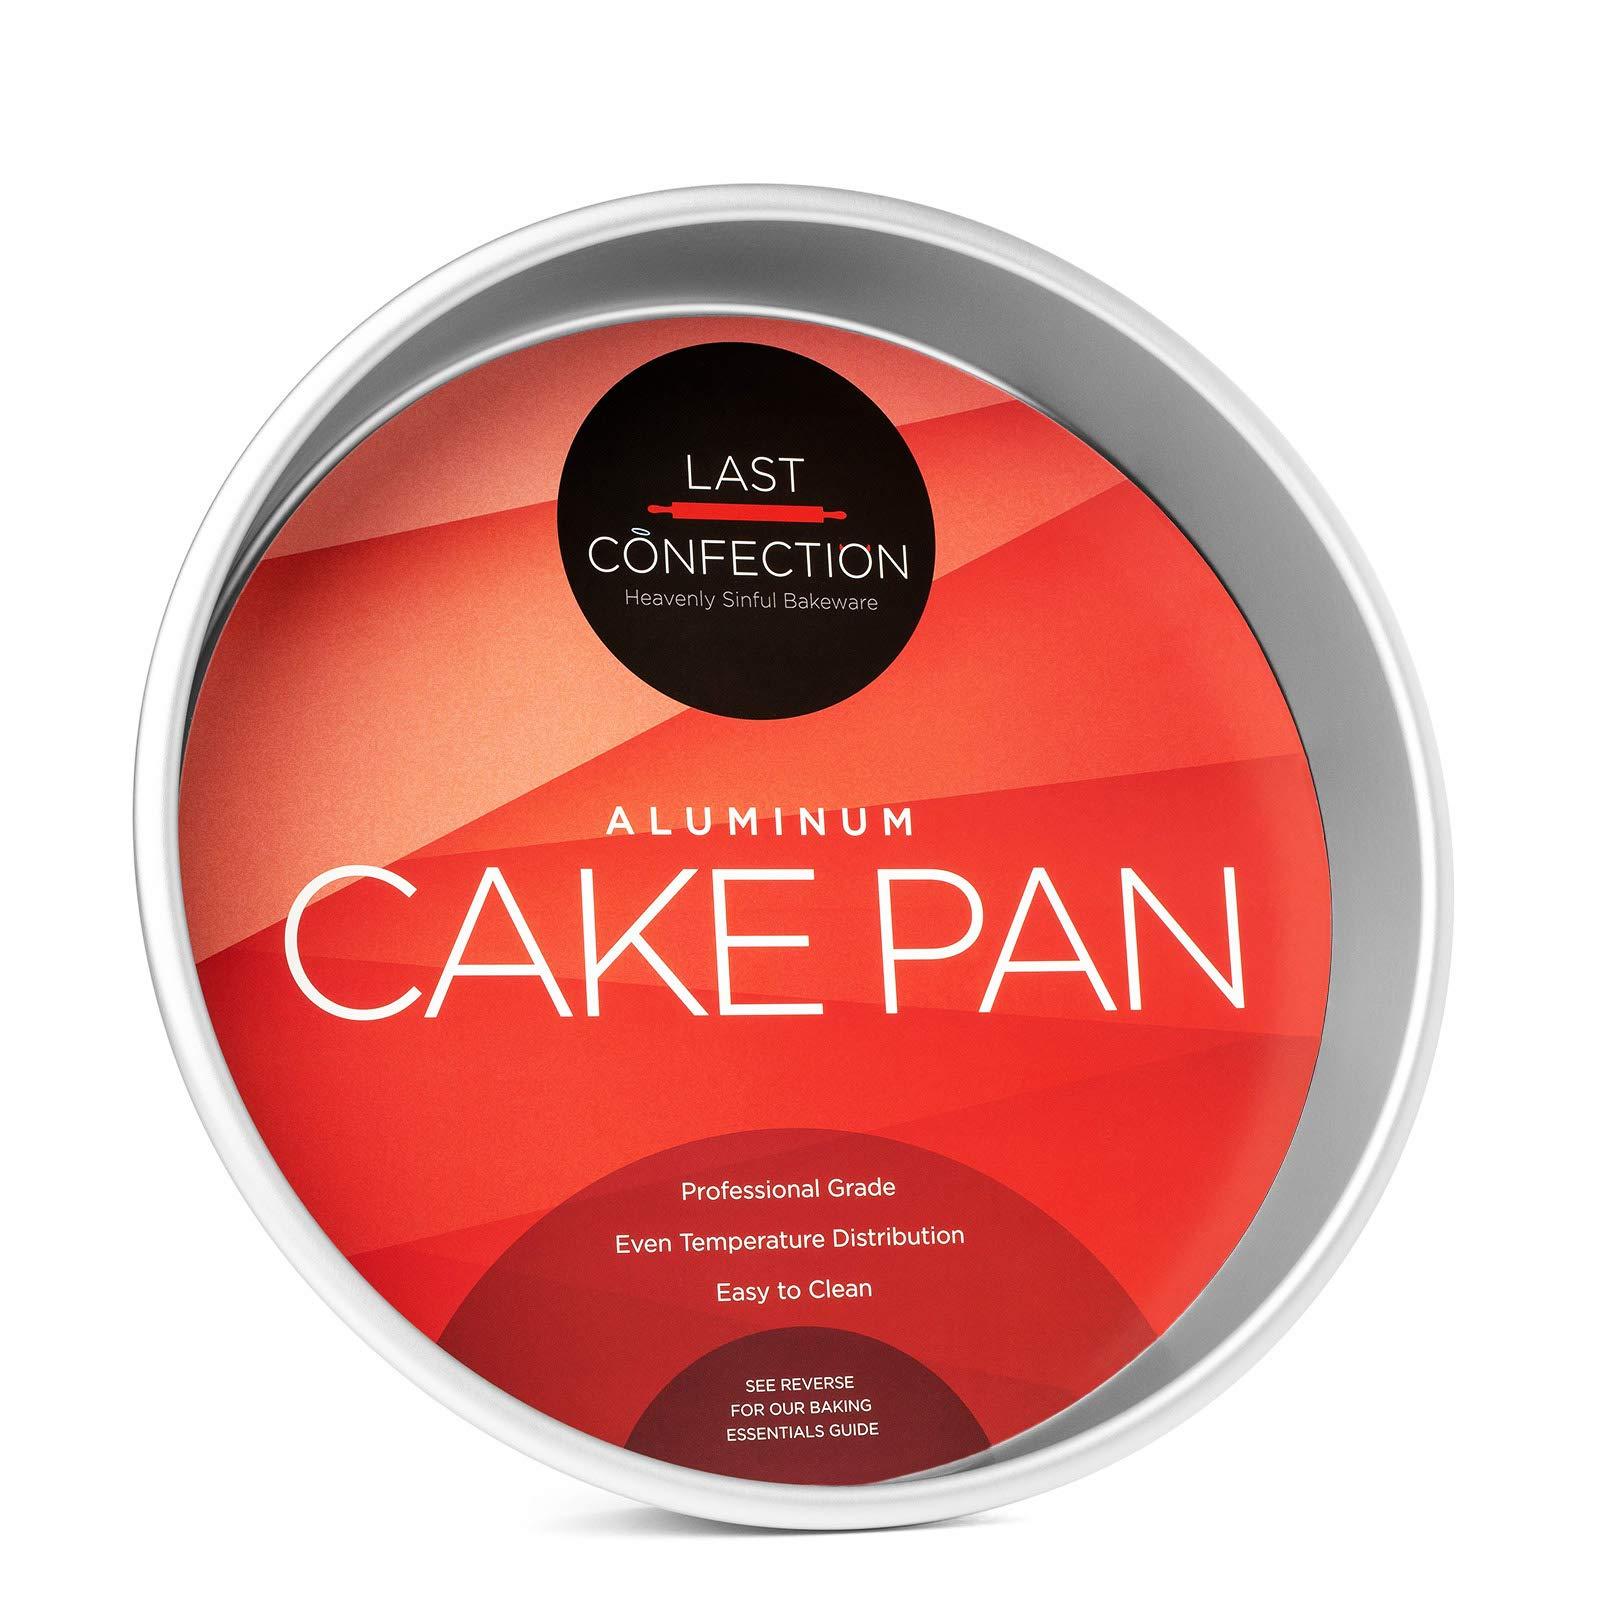 Last Confection 10'' x 2'' Deep Round Aluminum Cake Pan - Professional Bakeware